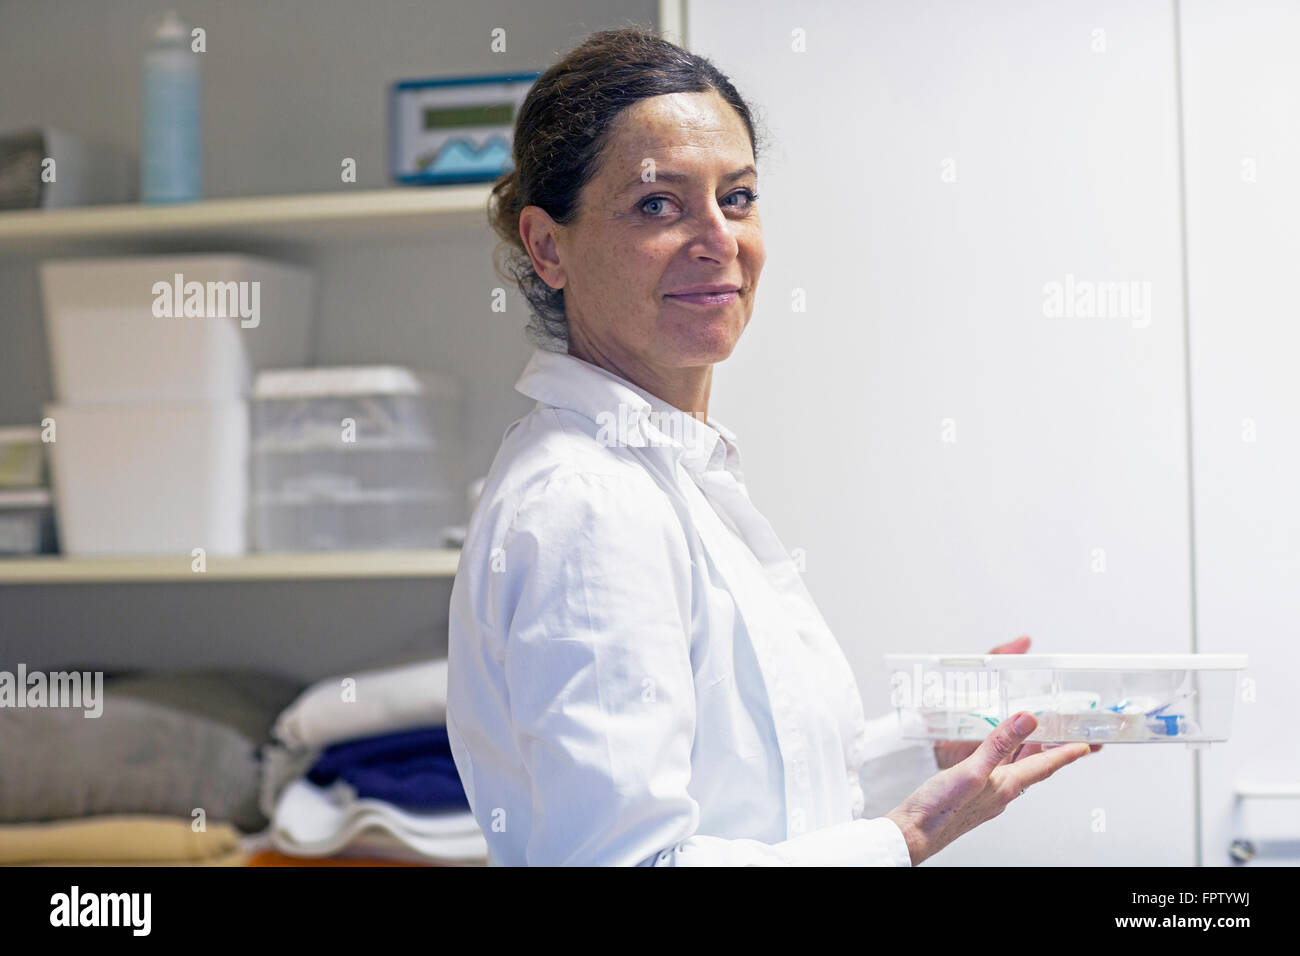 Portrait of a female doctor holding a medicine box, Freiburg Im Breisgau, Baden-Württemberg, Germany - Stock Image